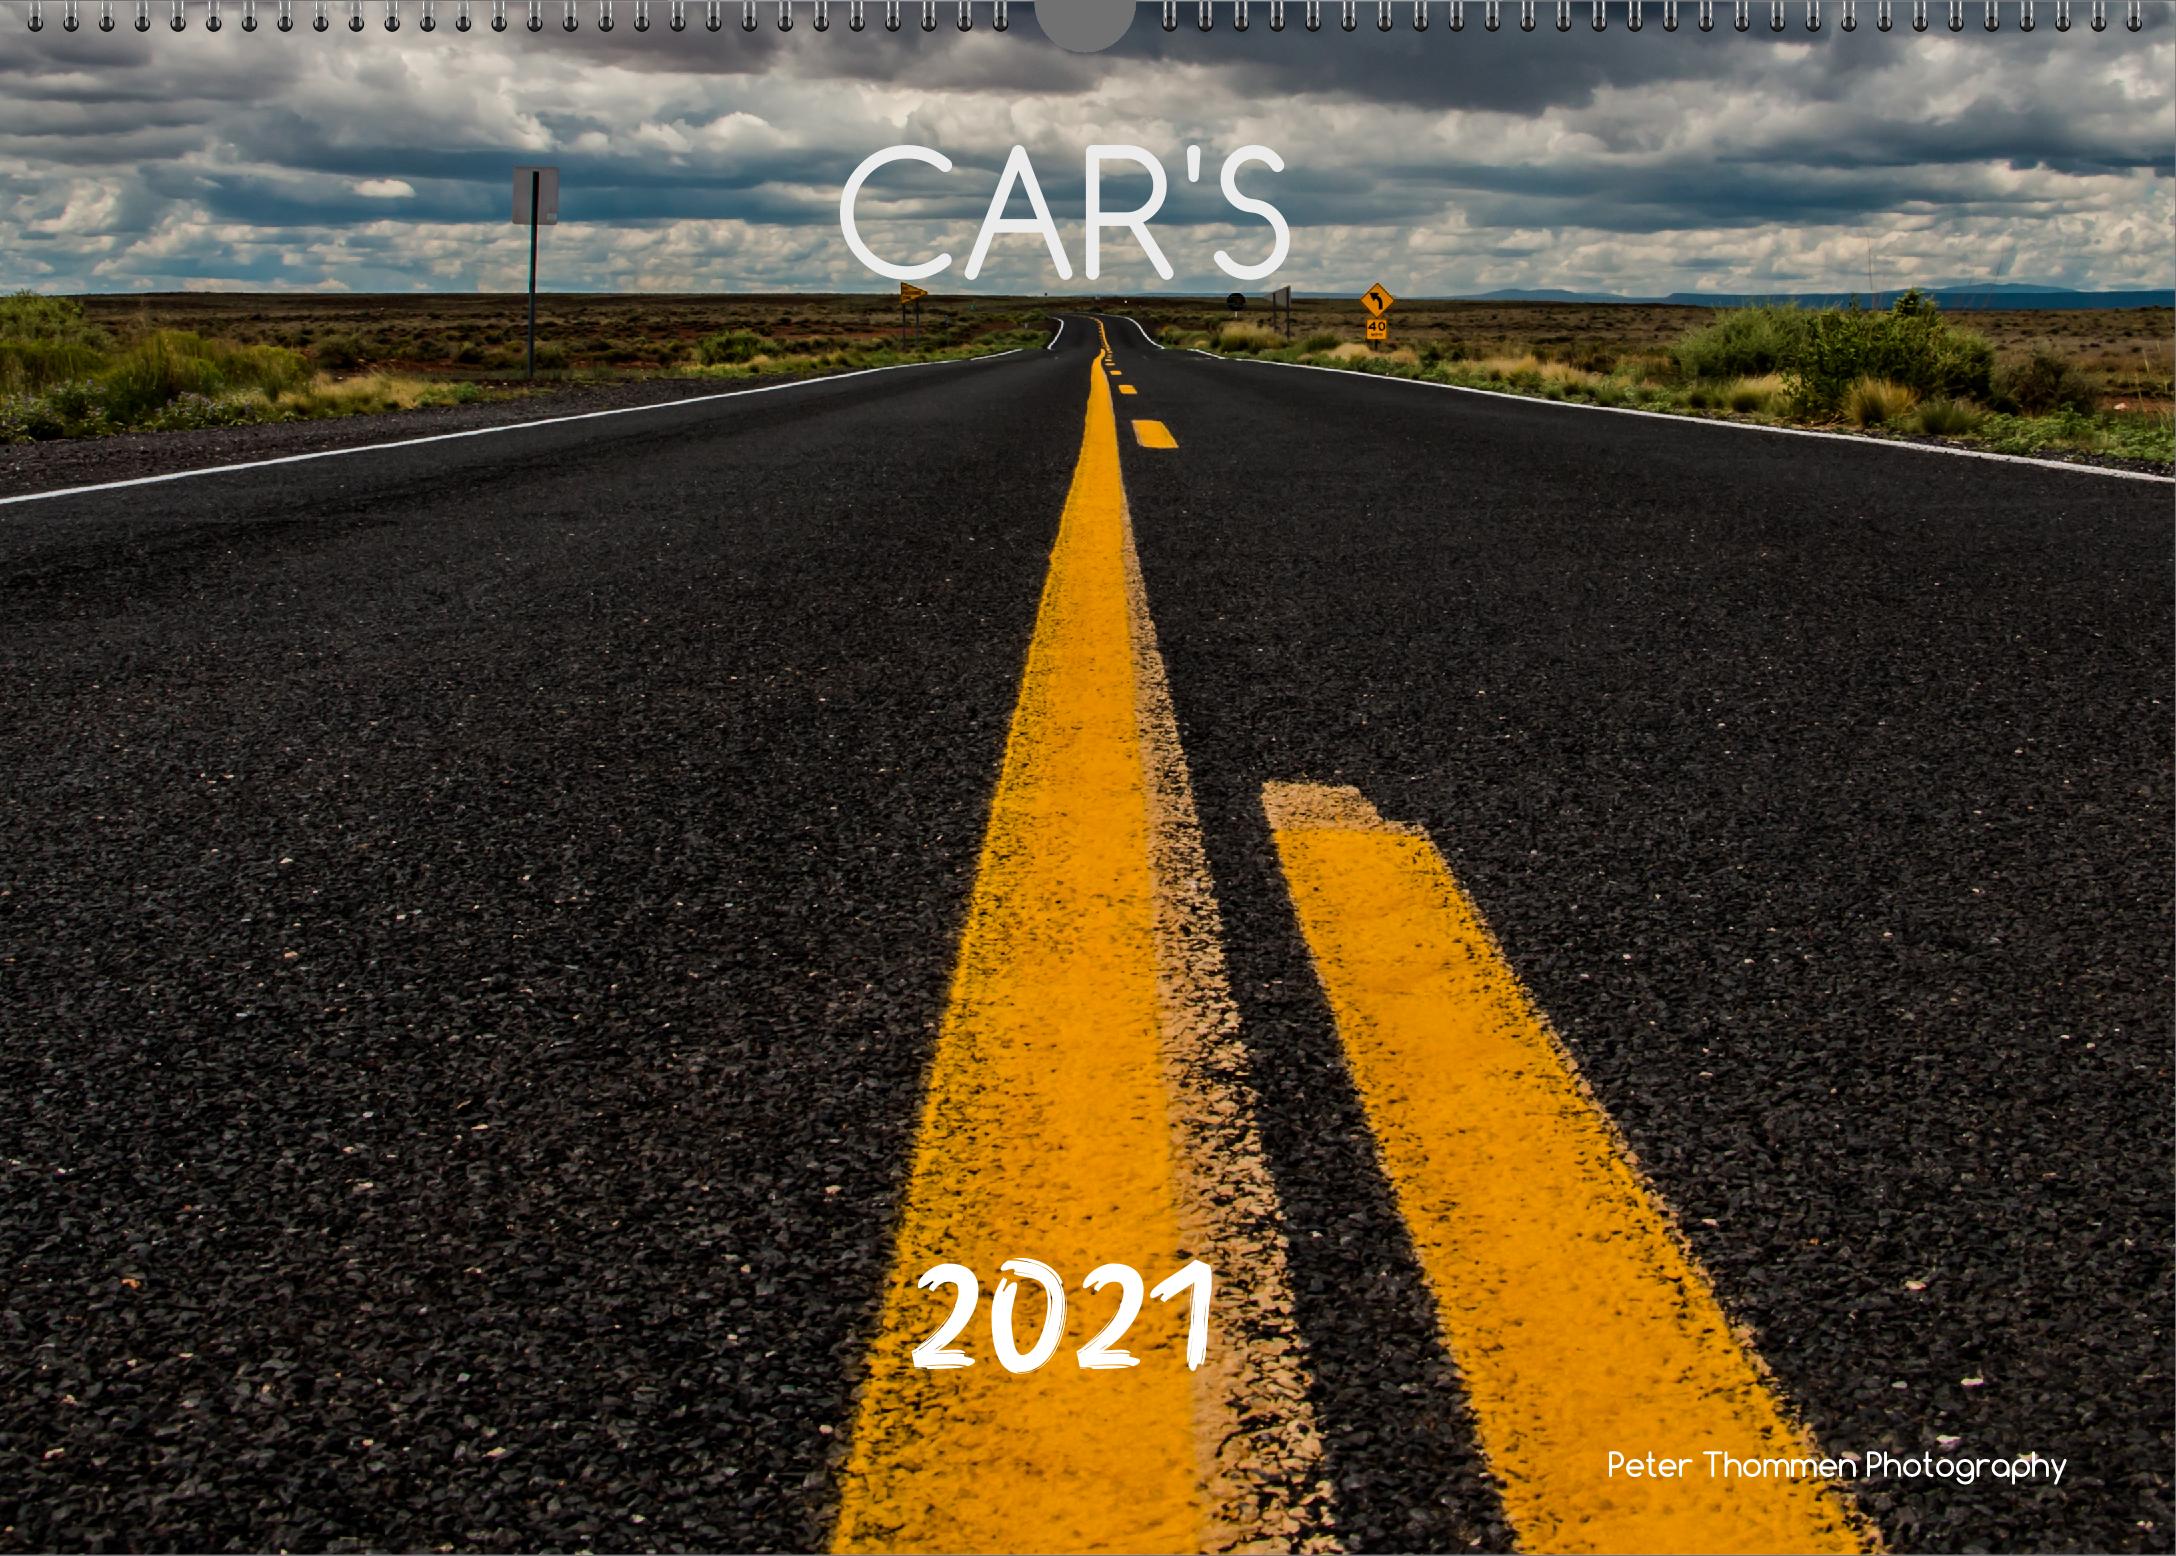 Kalender Car's 2021